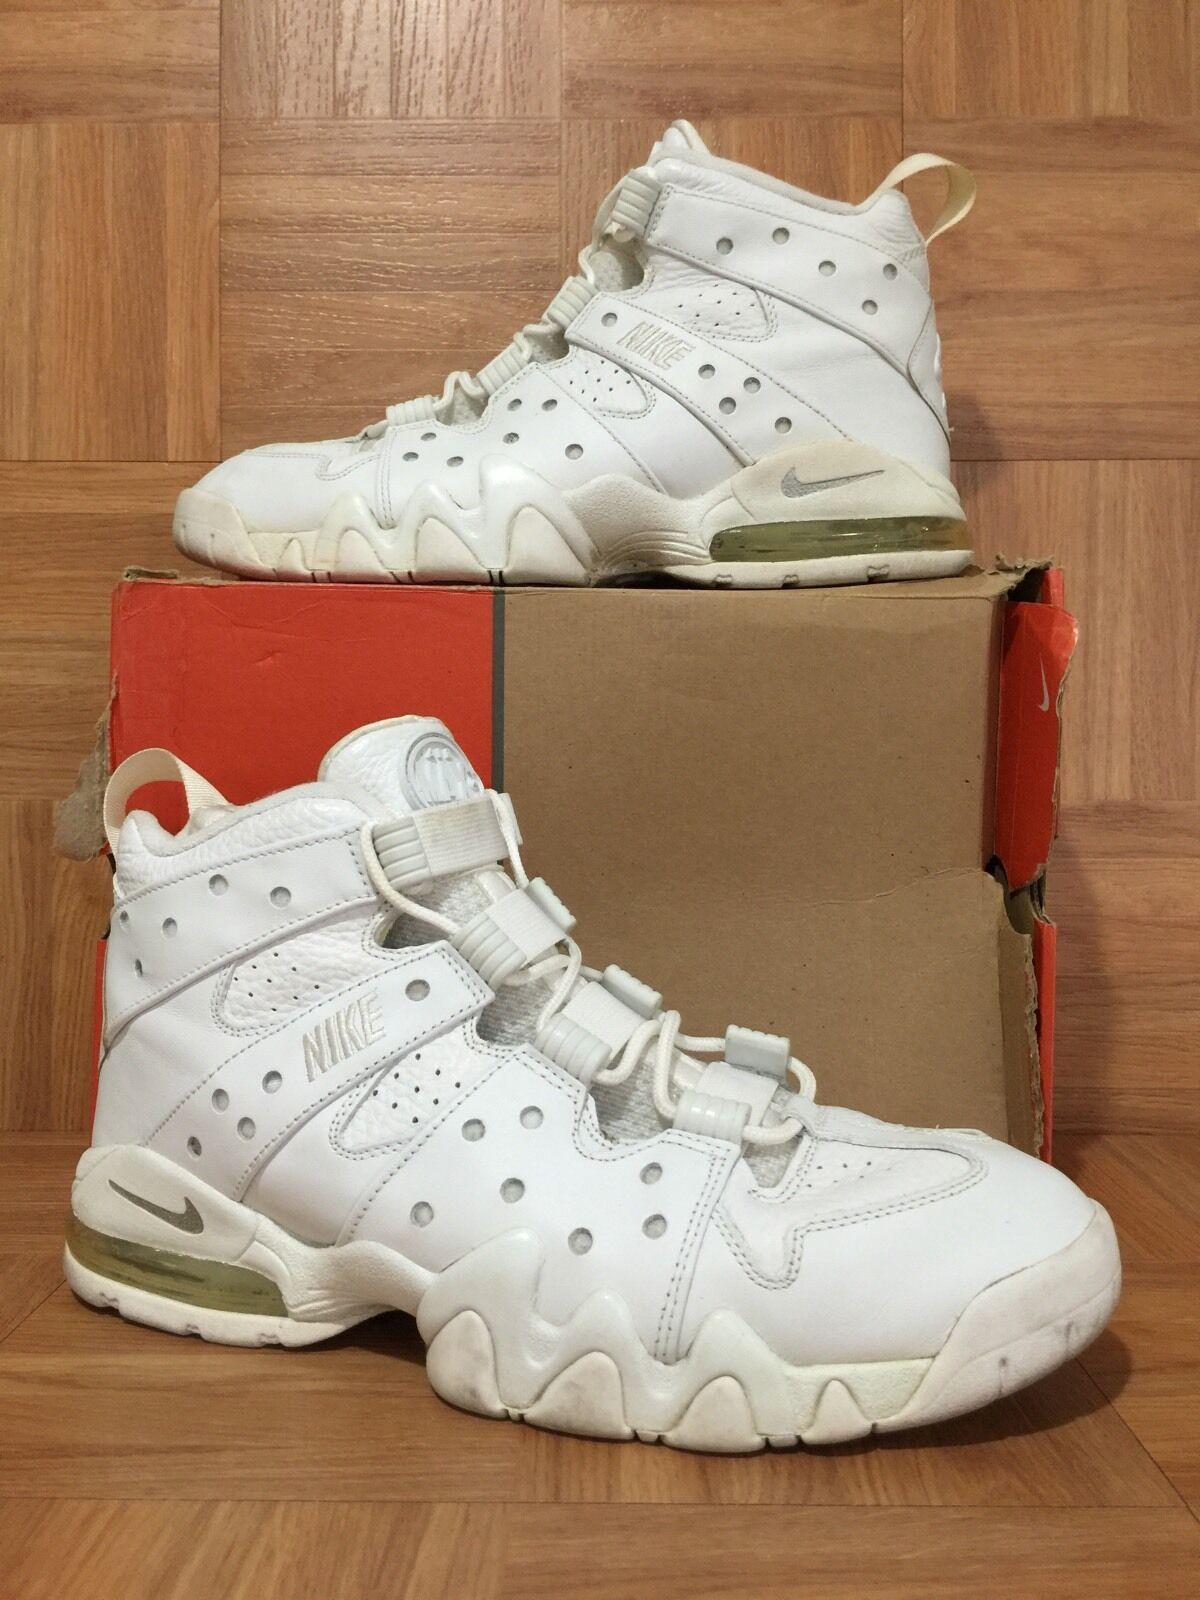 RARE Nike Air Max II CB '94 Charles Barkley White Metallic Size 12 305440-111